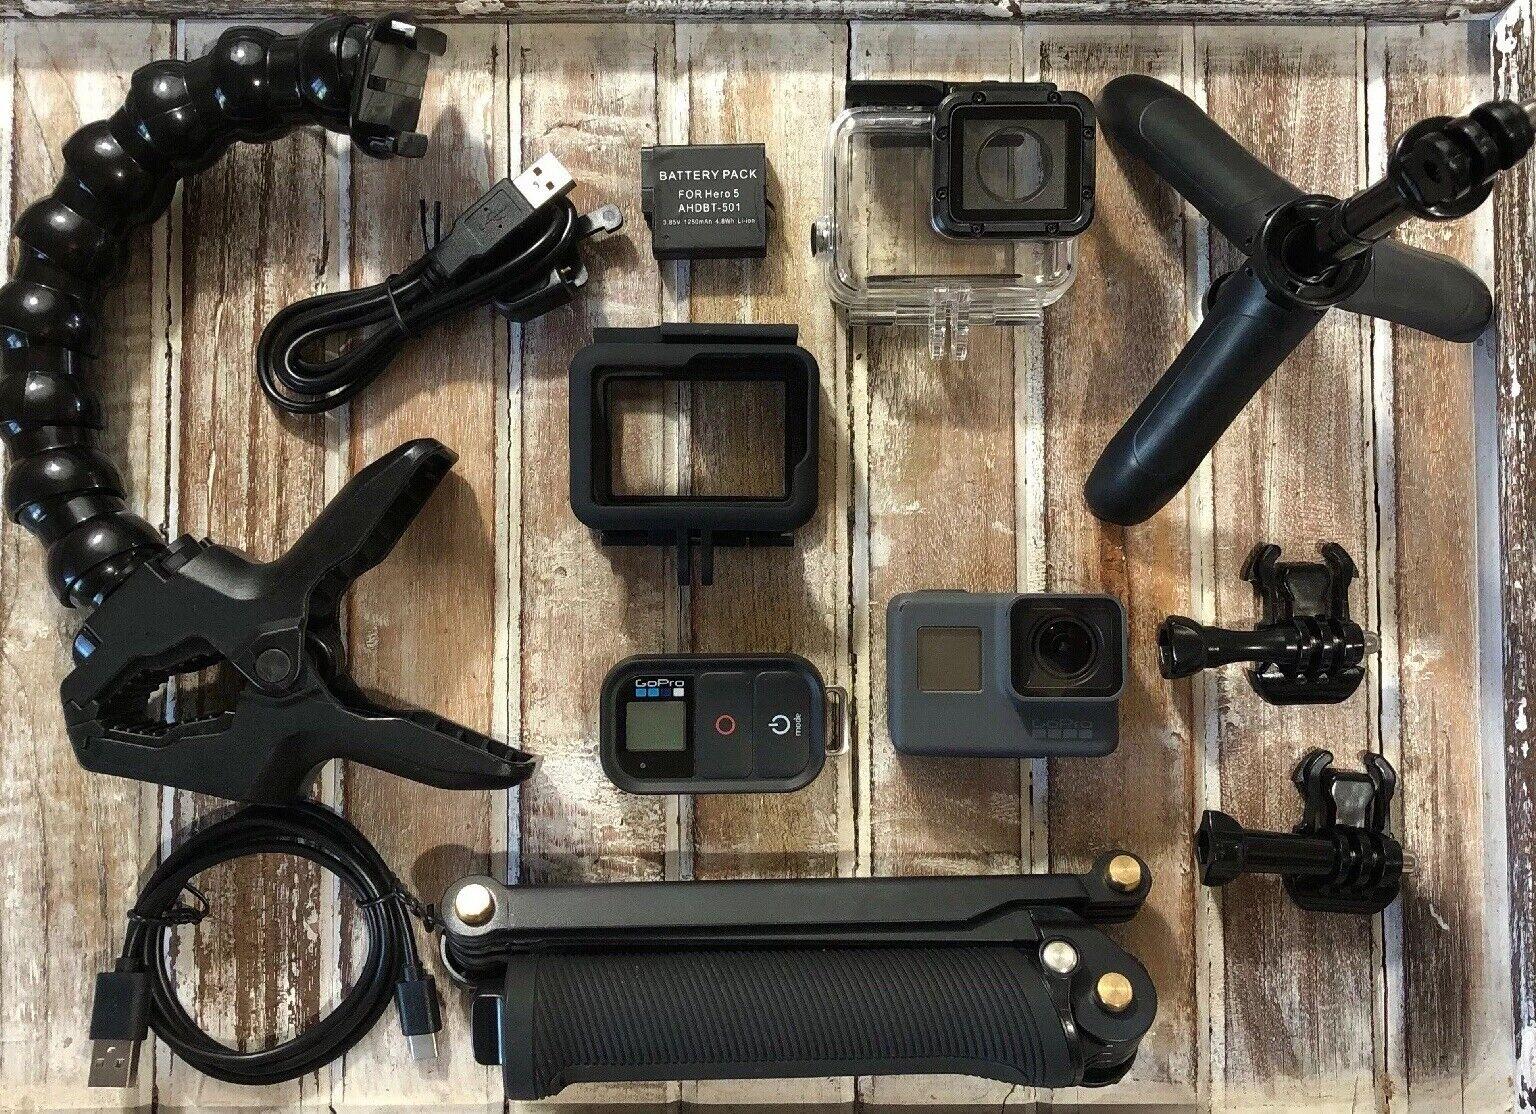 GoPro Hero5 Black CHDHX-501 Camera - Smart Remote + Adventure Bundle